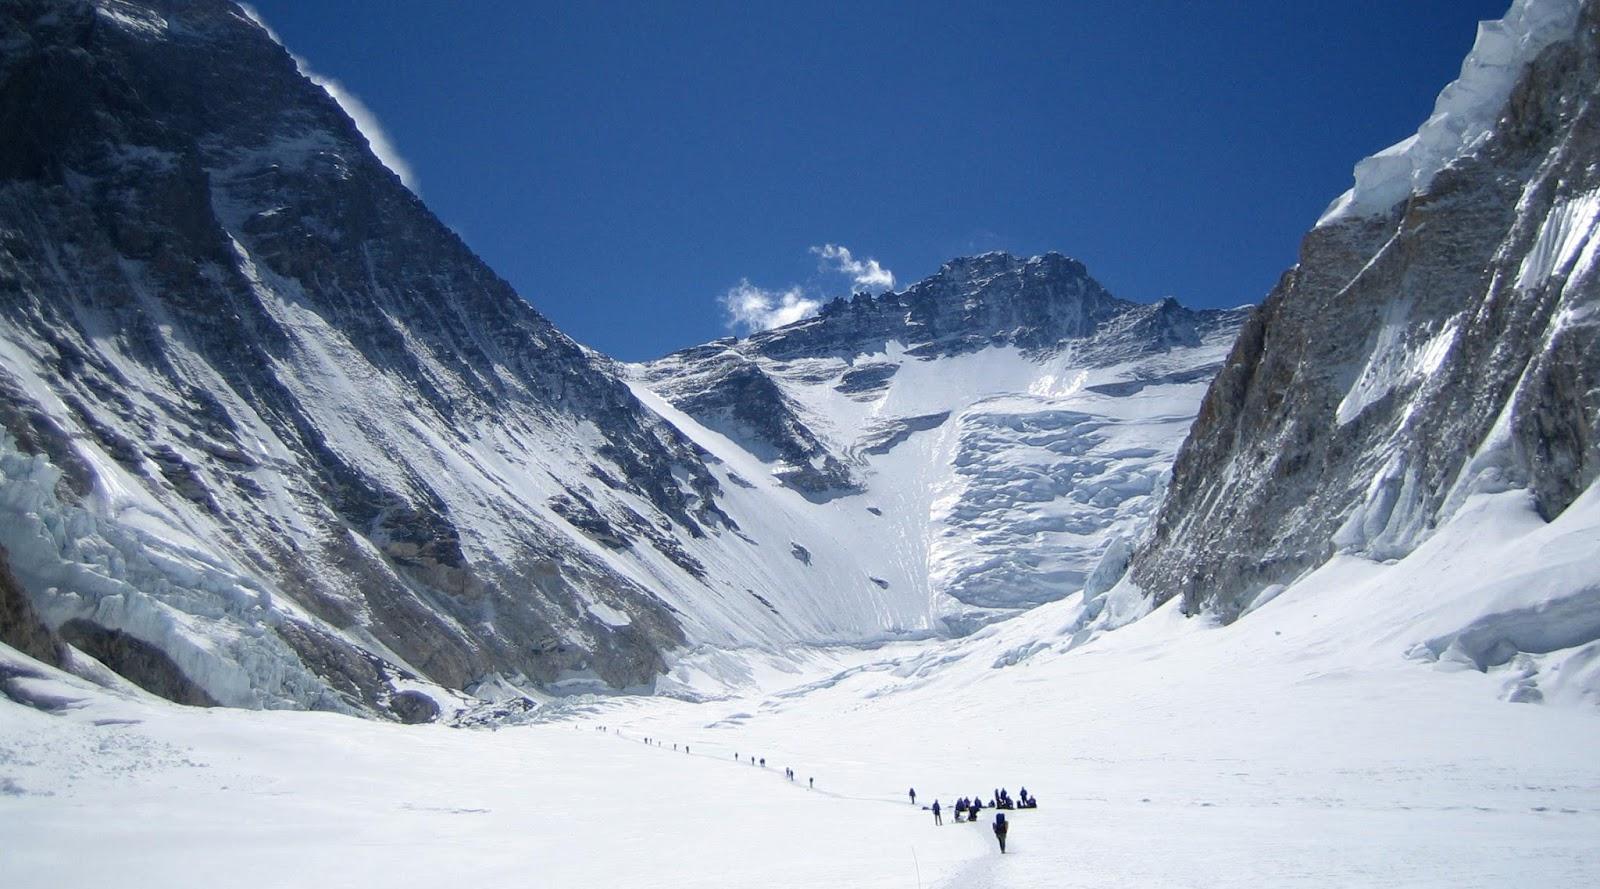 gunung tertinggi dunia di papua gunung tertinggi i dunia gunung tertinggi ke 2 di dunia gunung tertinggi ke 2 didunia gunung tertinggi ke 3 di dunia